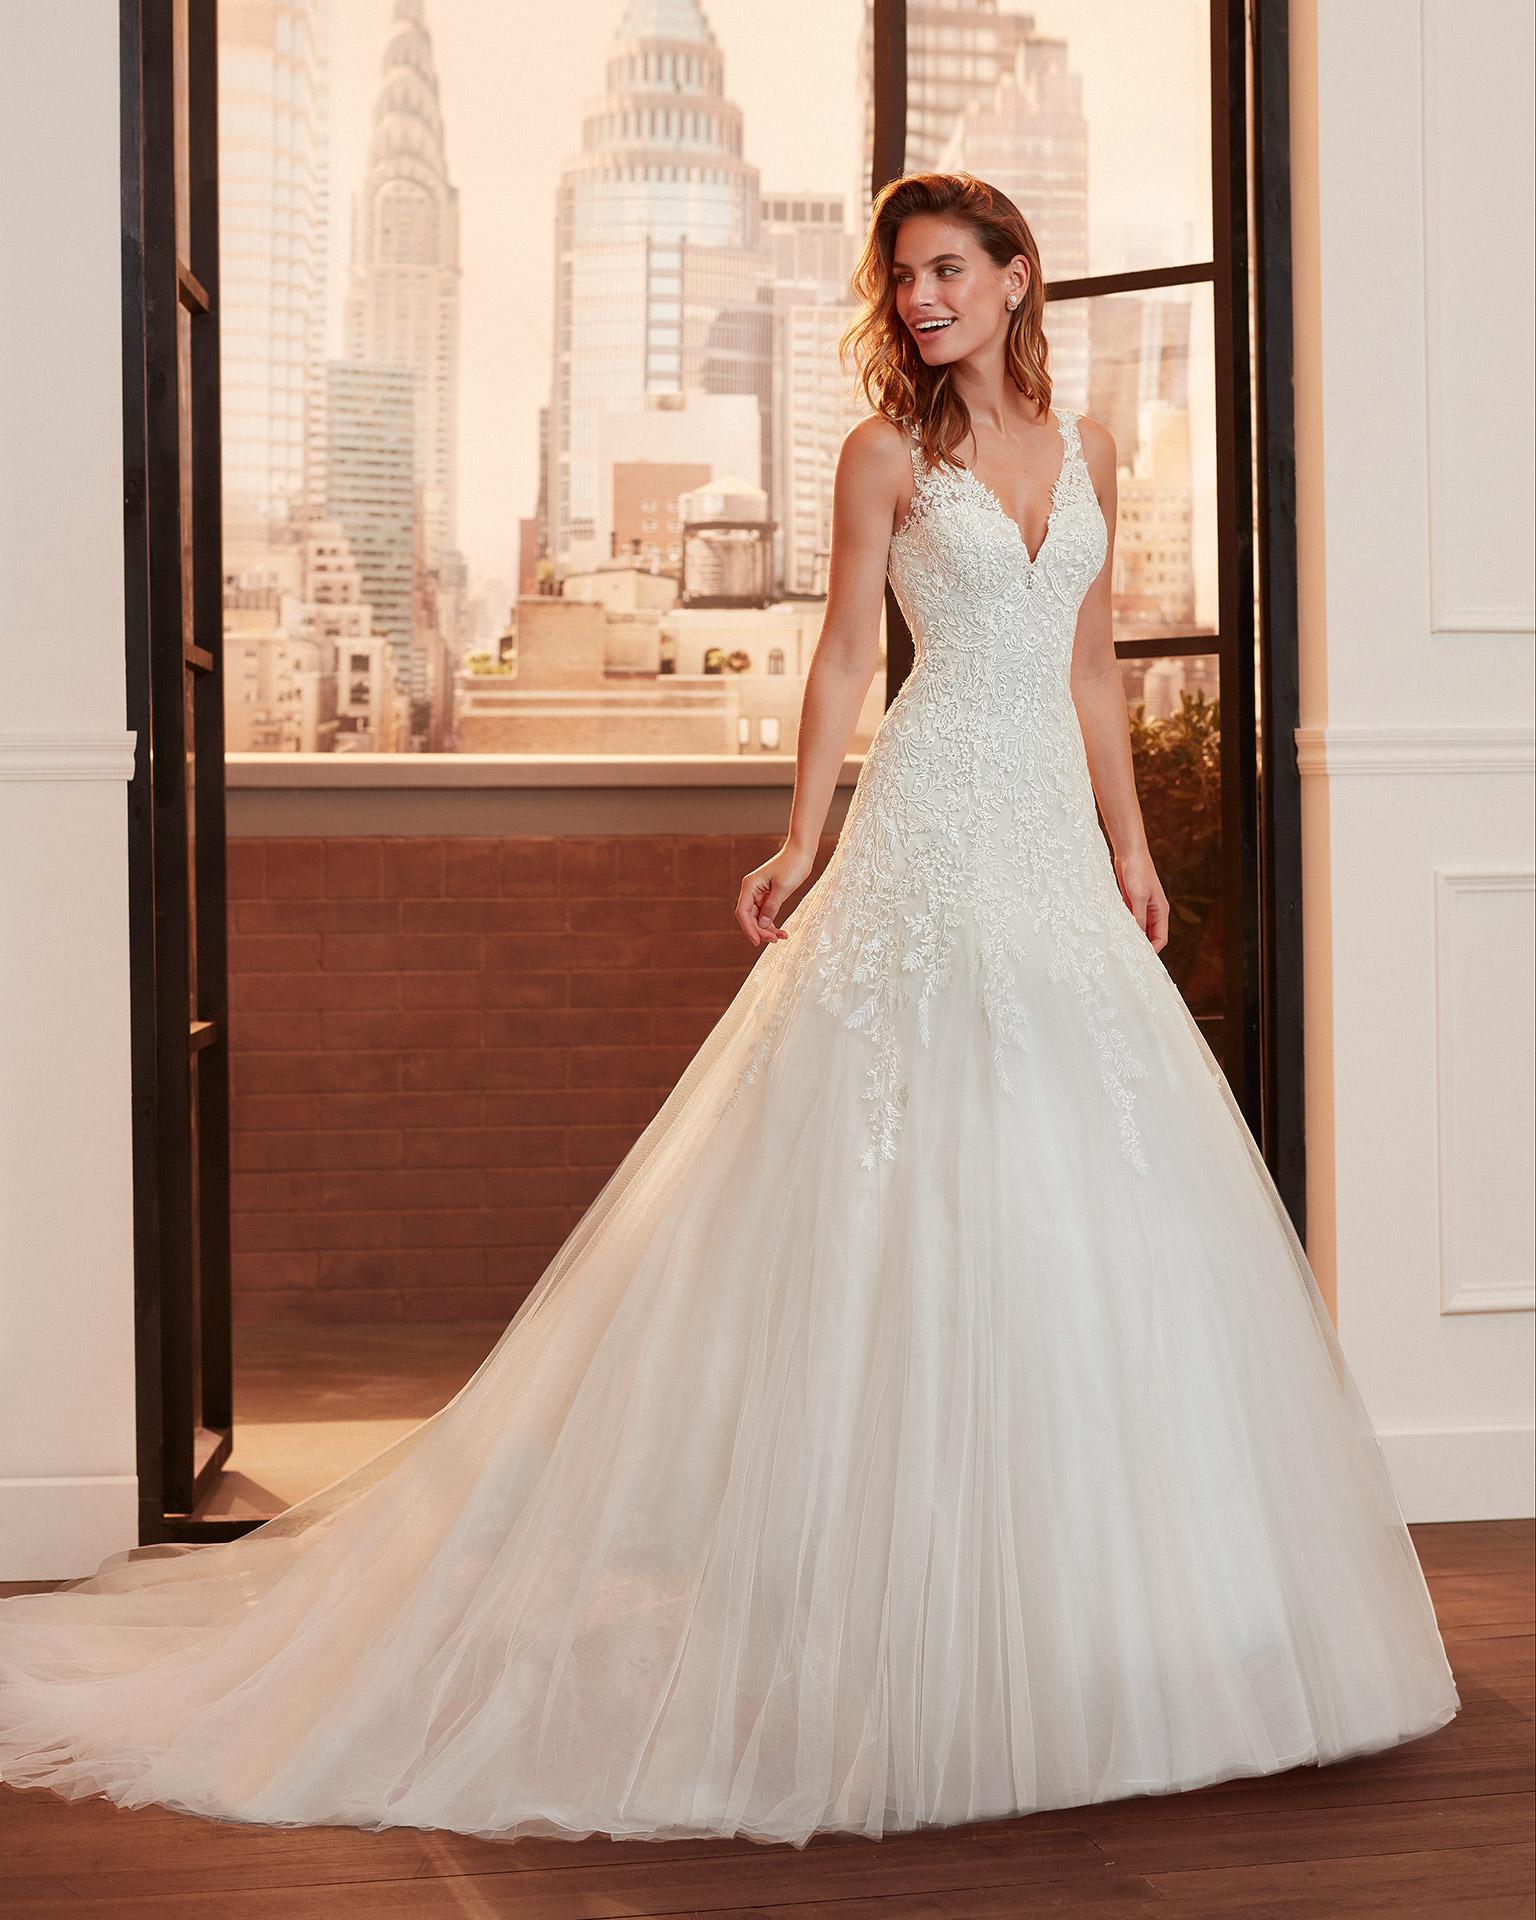 Vestito da Sposa Rosa Clara Levana by Lunanovias